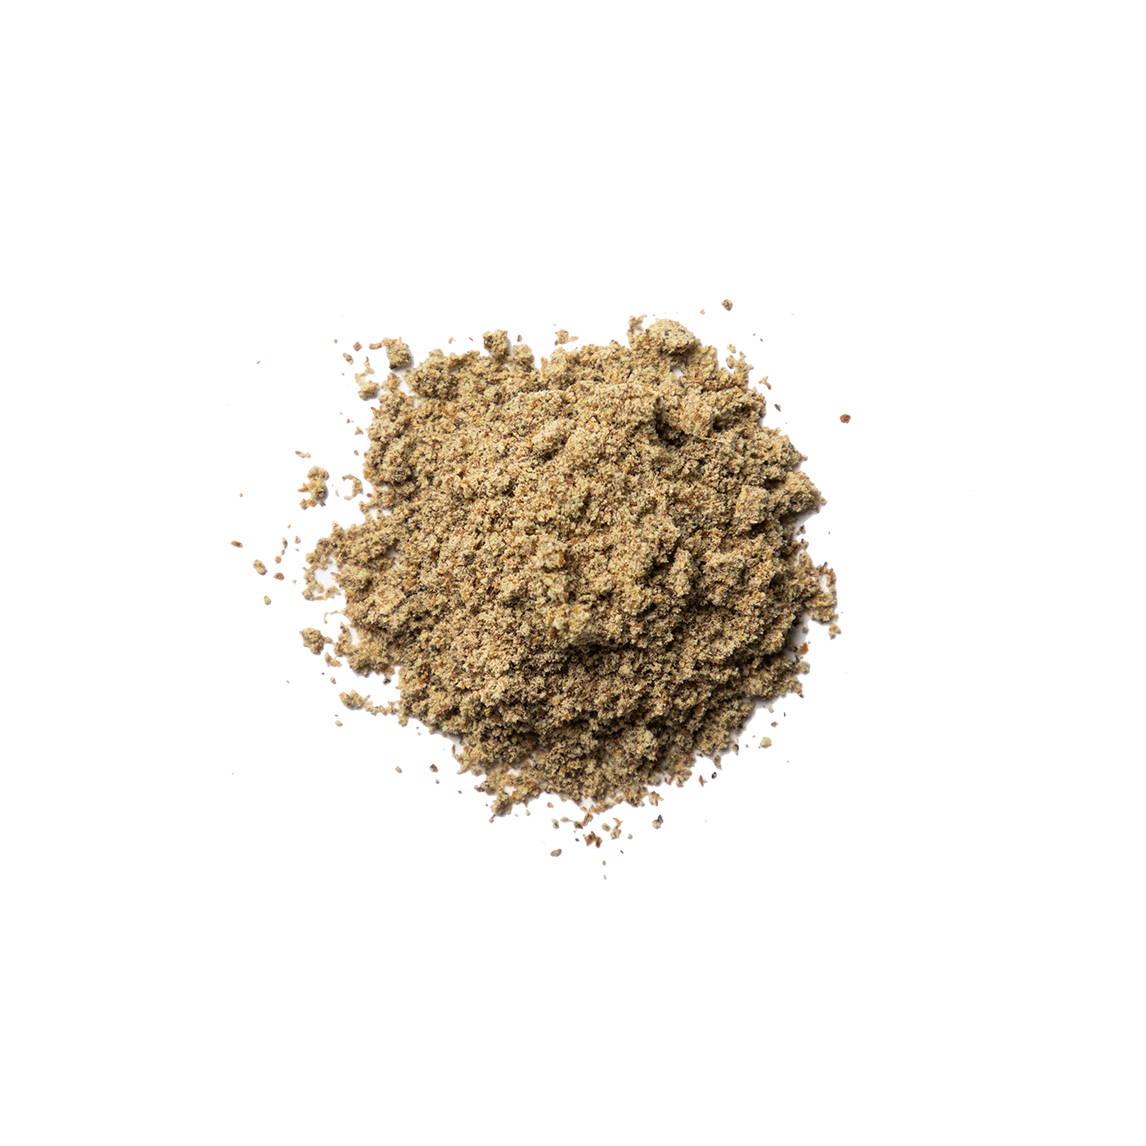 Nature Restore Organic Milk Thistle Powder